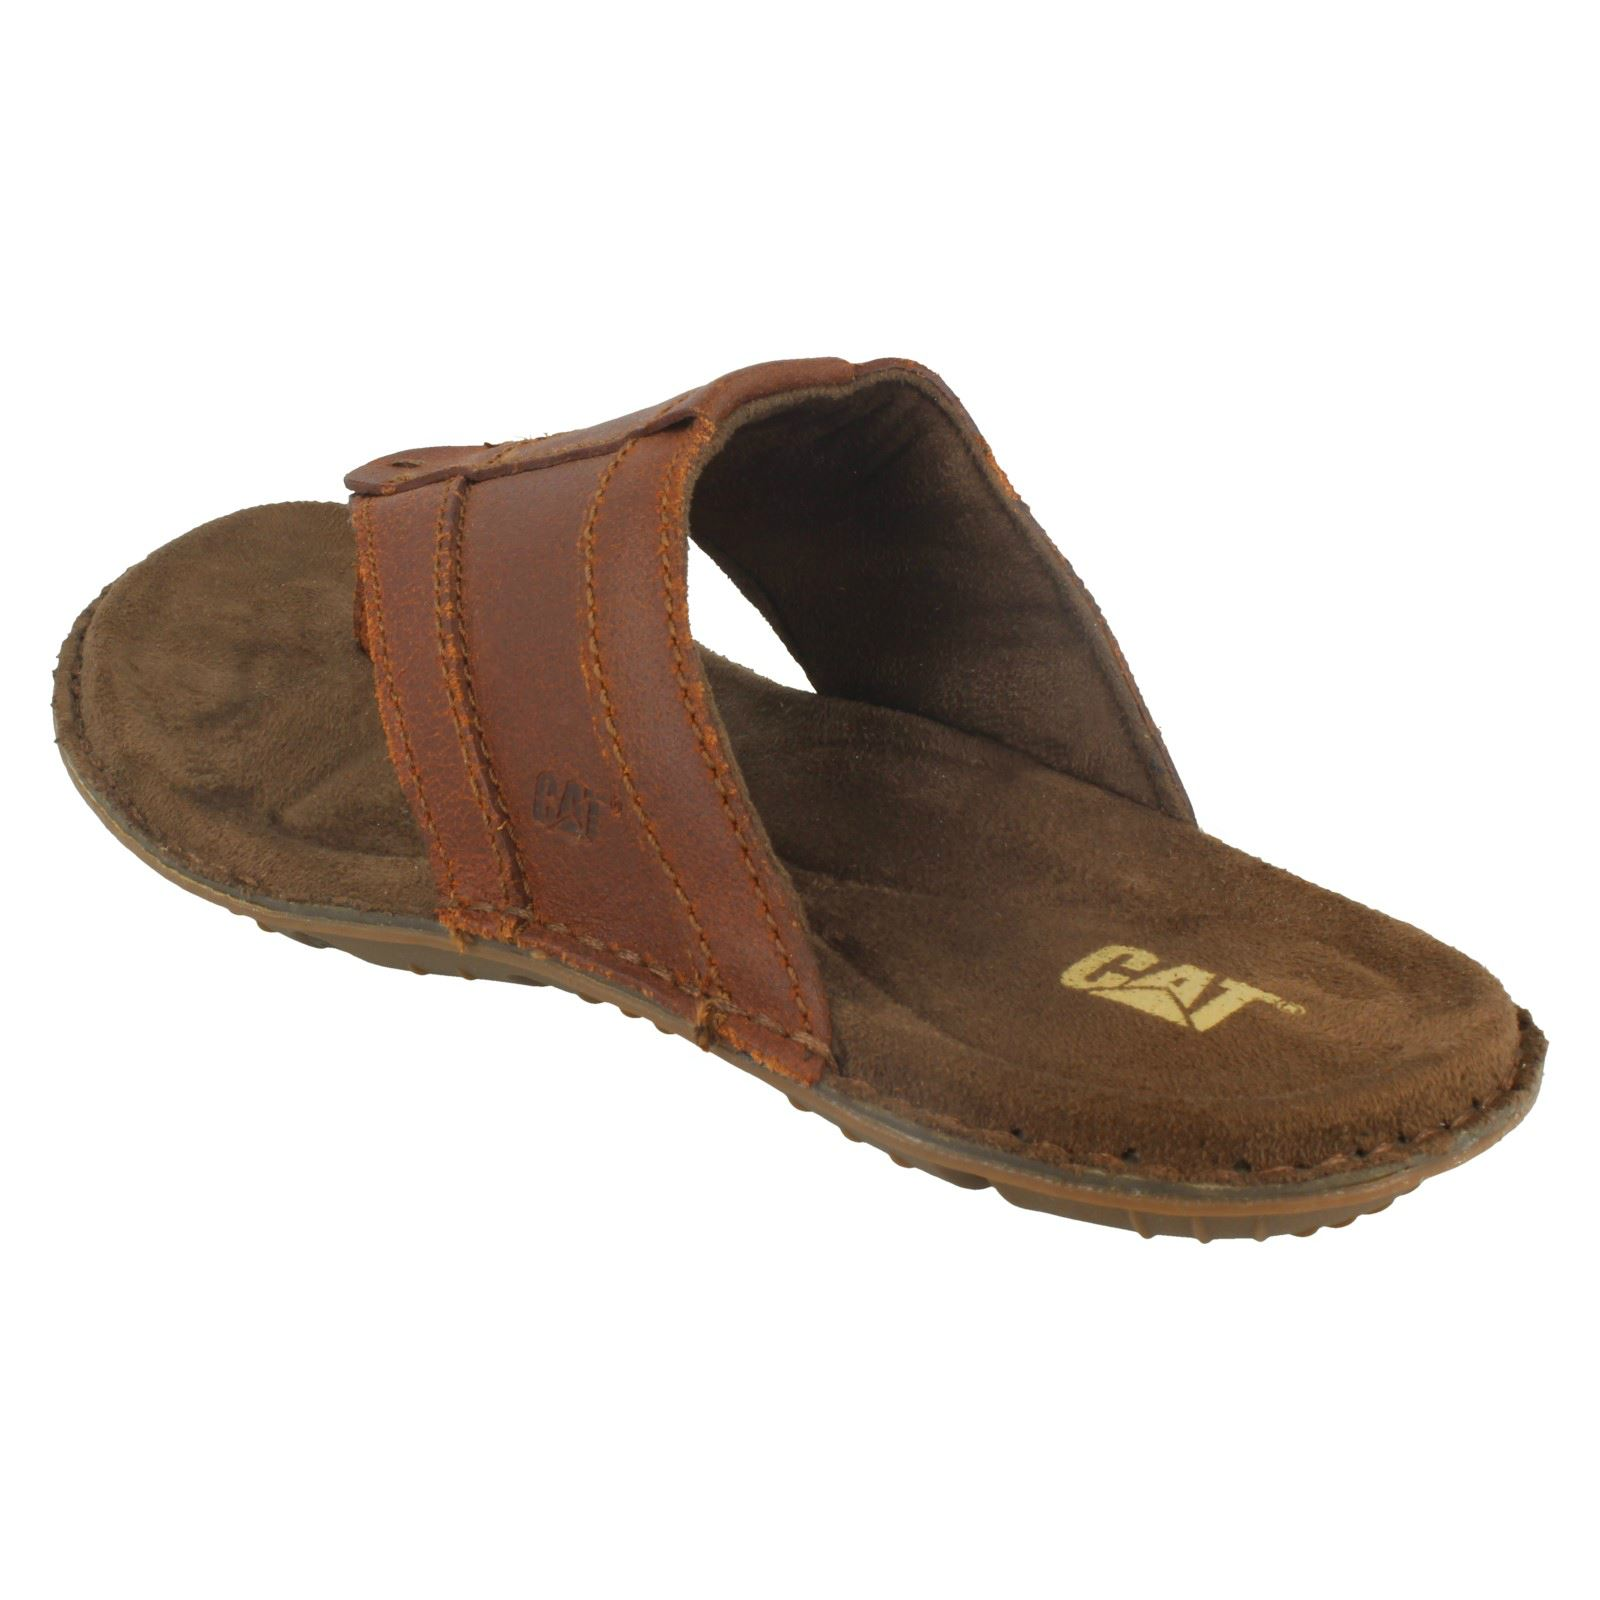 Homme Caterpillar toe post sandals Galley